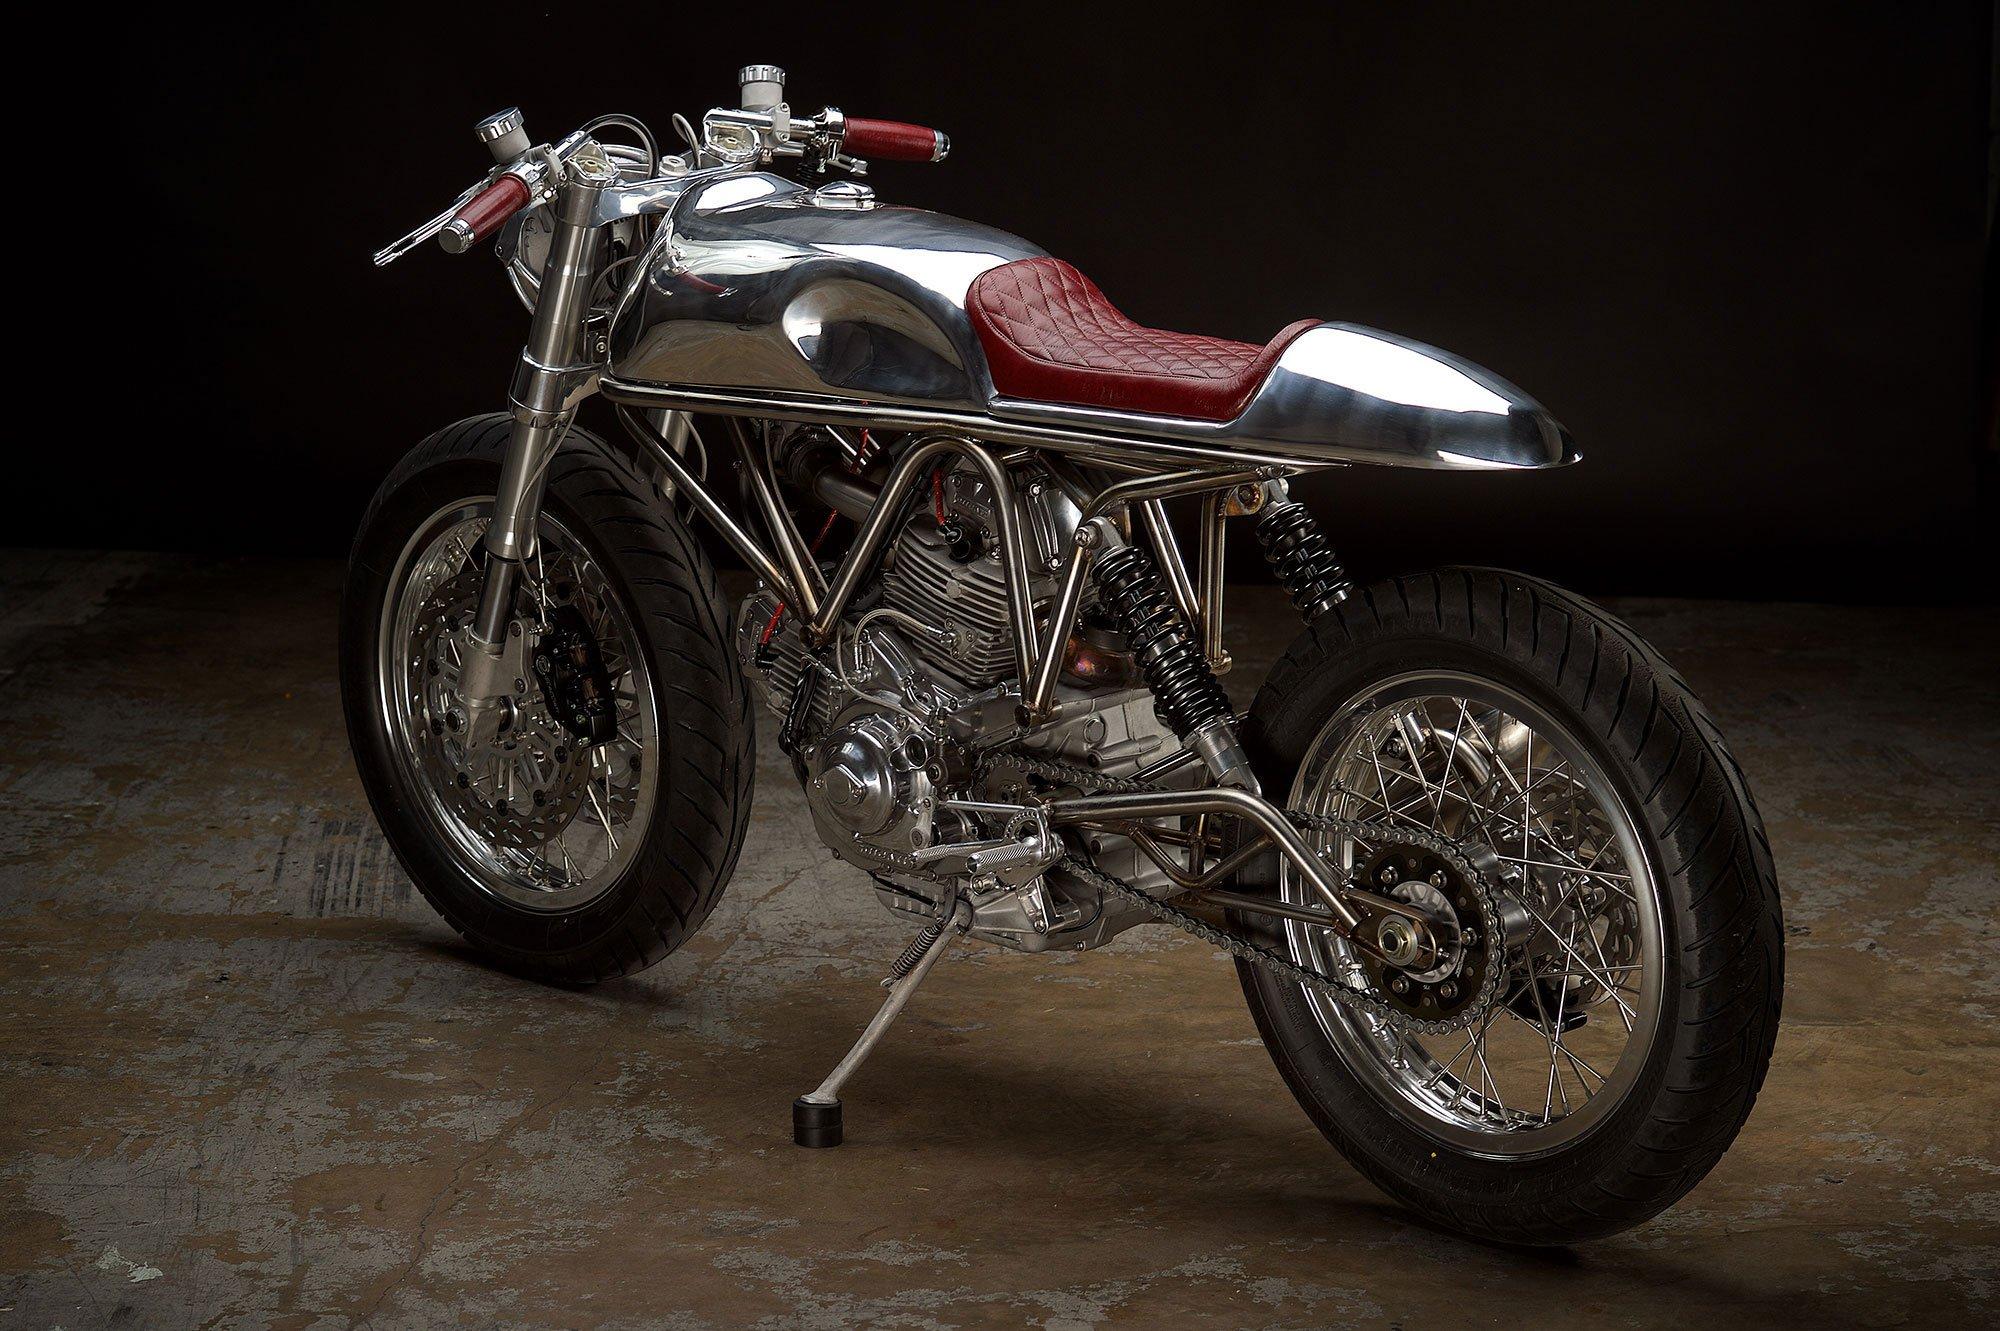 ducati-900ss-sp-j63-custom-build-by-revival-cycles-4